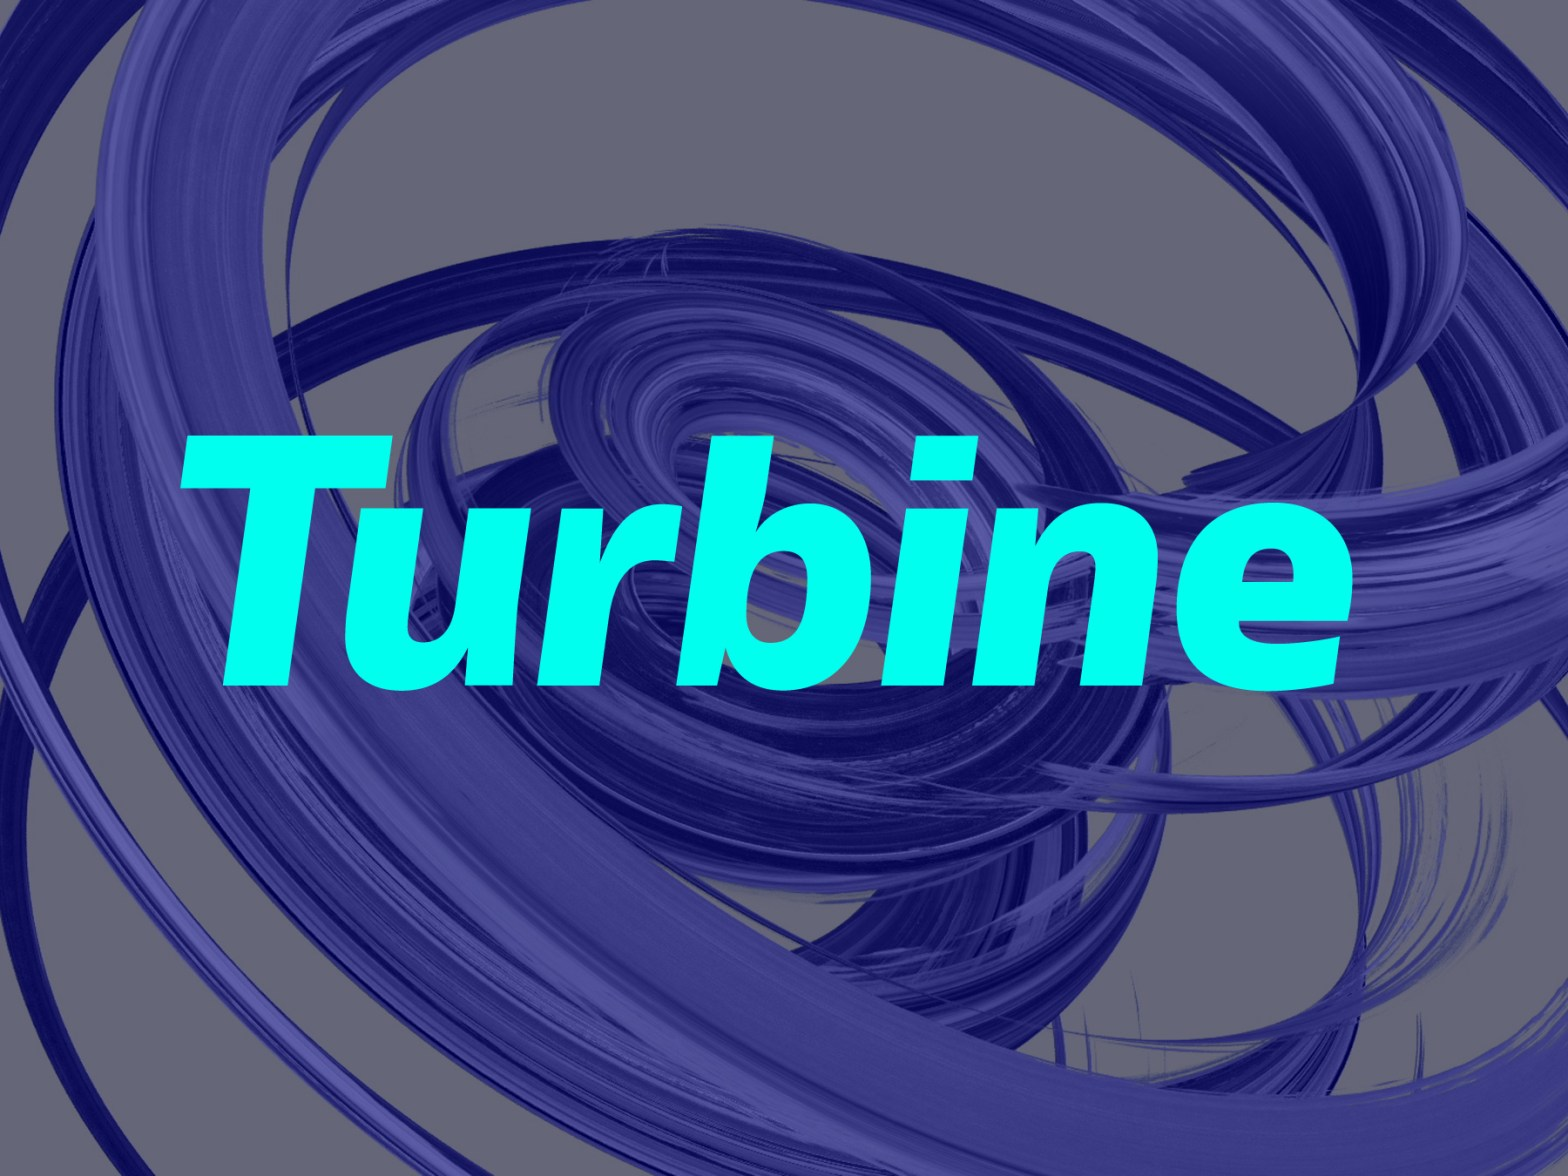 Thumbnail for Type Tuesday: The Super Super-Elliptical Turbine